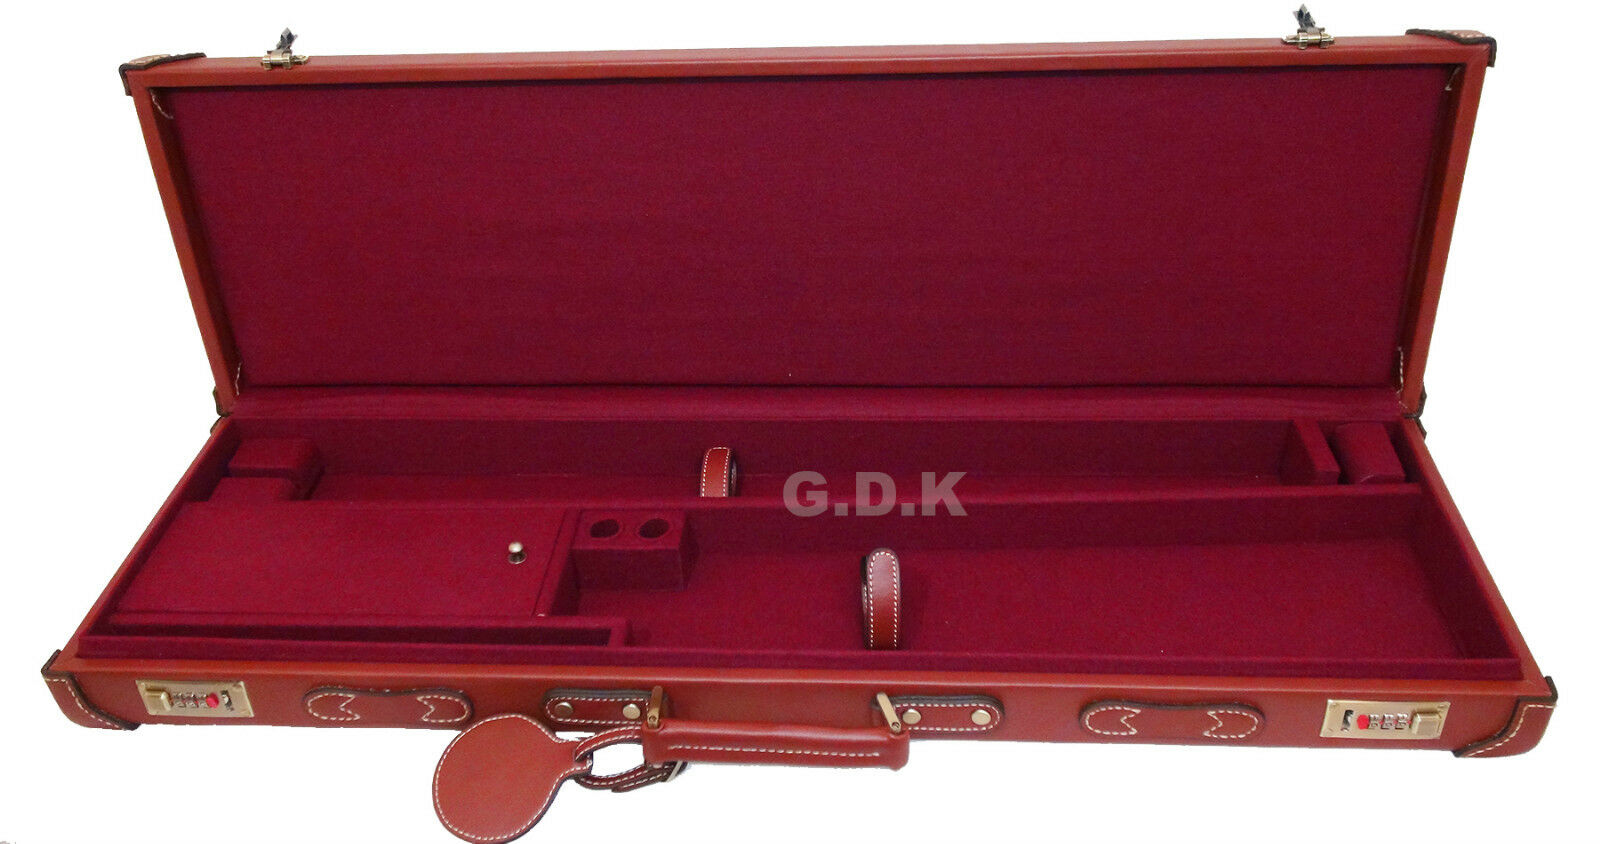 Gdk Guardian, marrón de cuero Shotgun-maleta, 66-81.3cm rifle de ejecución escopeta